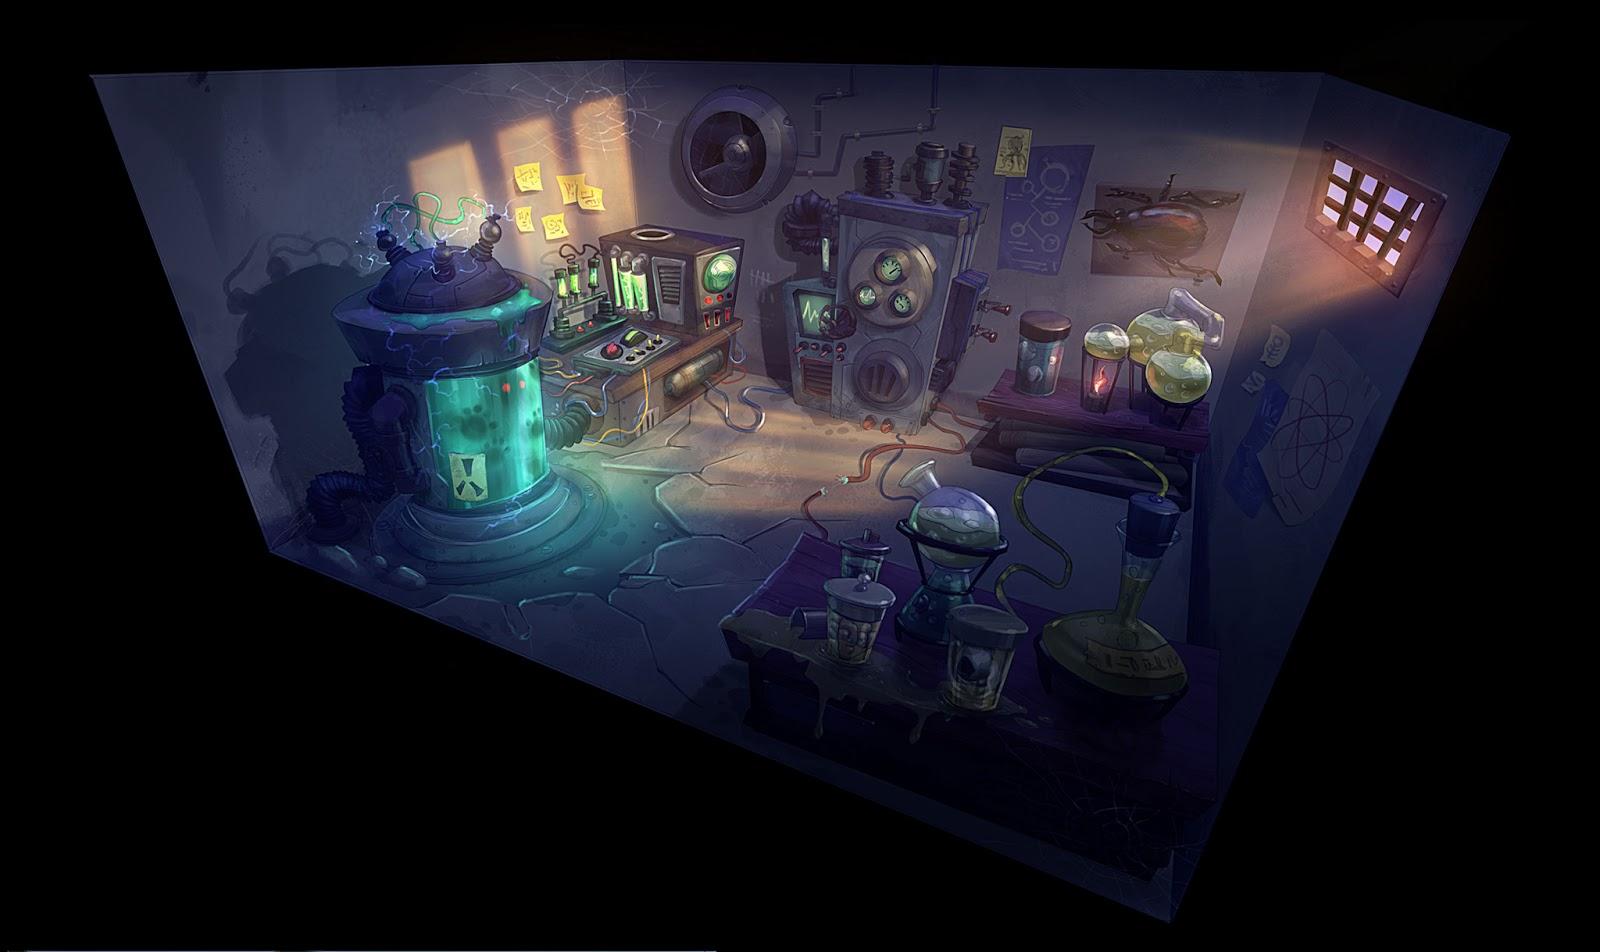 Haunted House 3d Wallpaper Jose Cua S Sketchblog Mad Scientists Laboratory